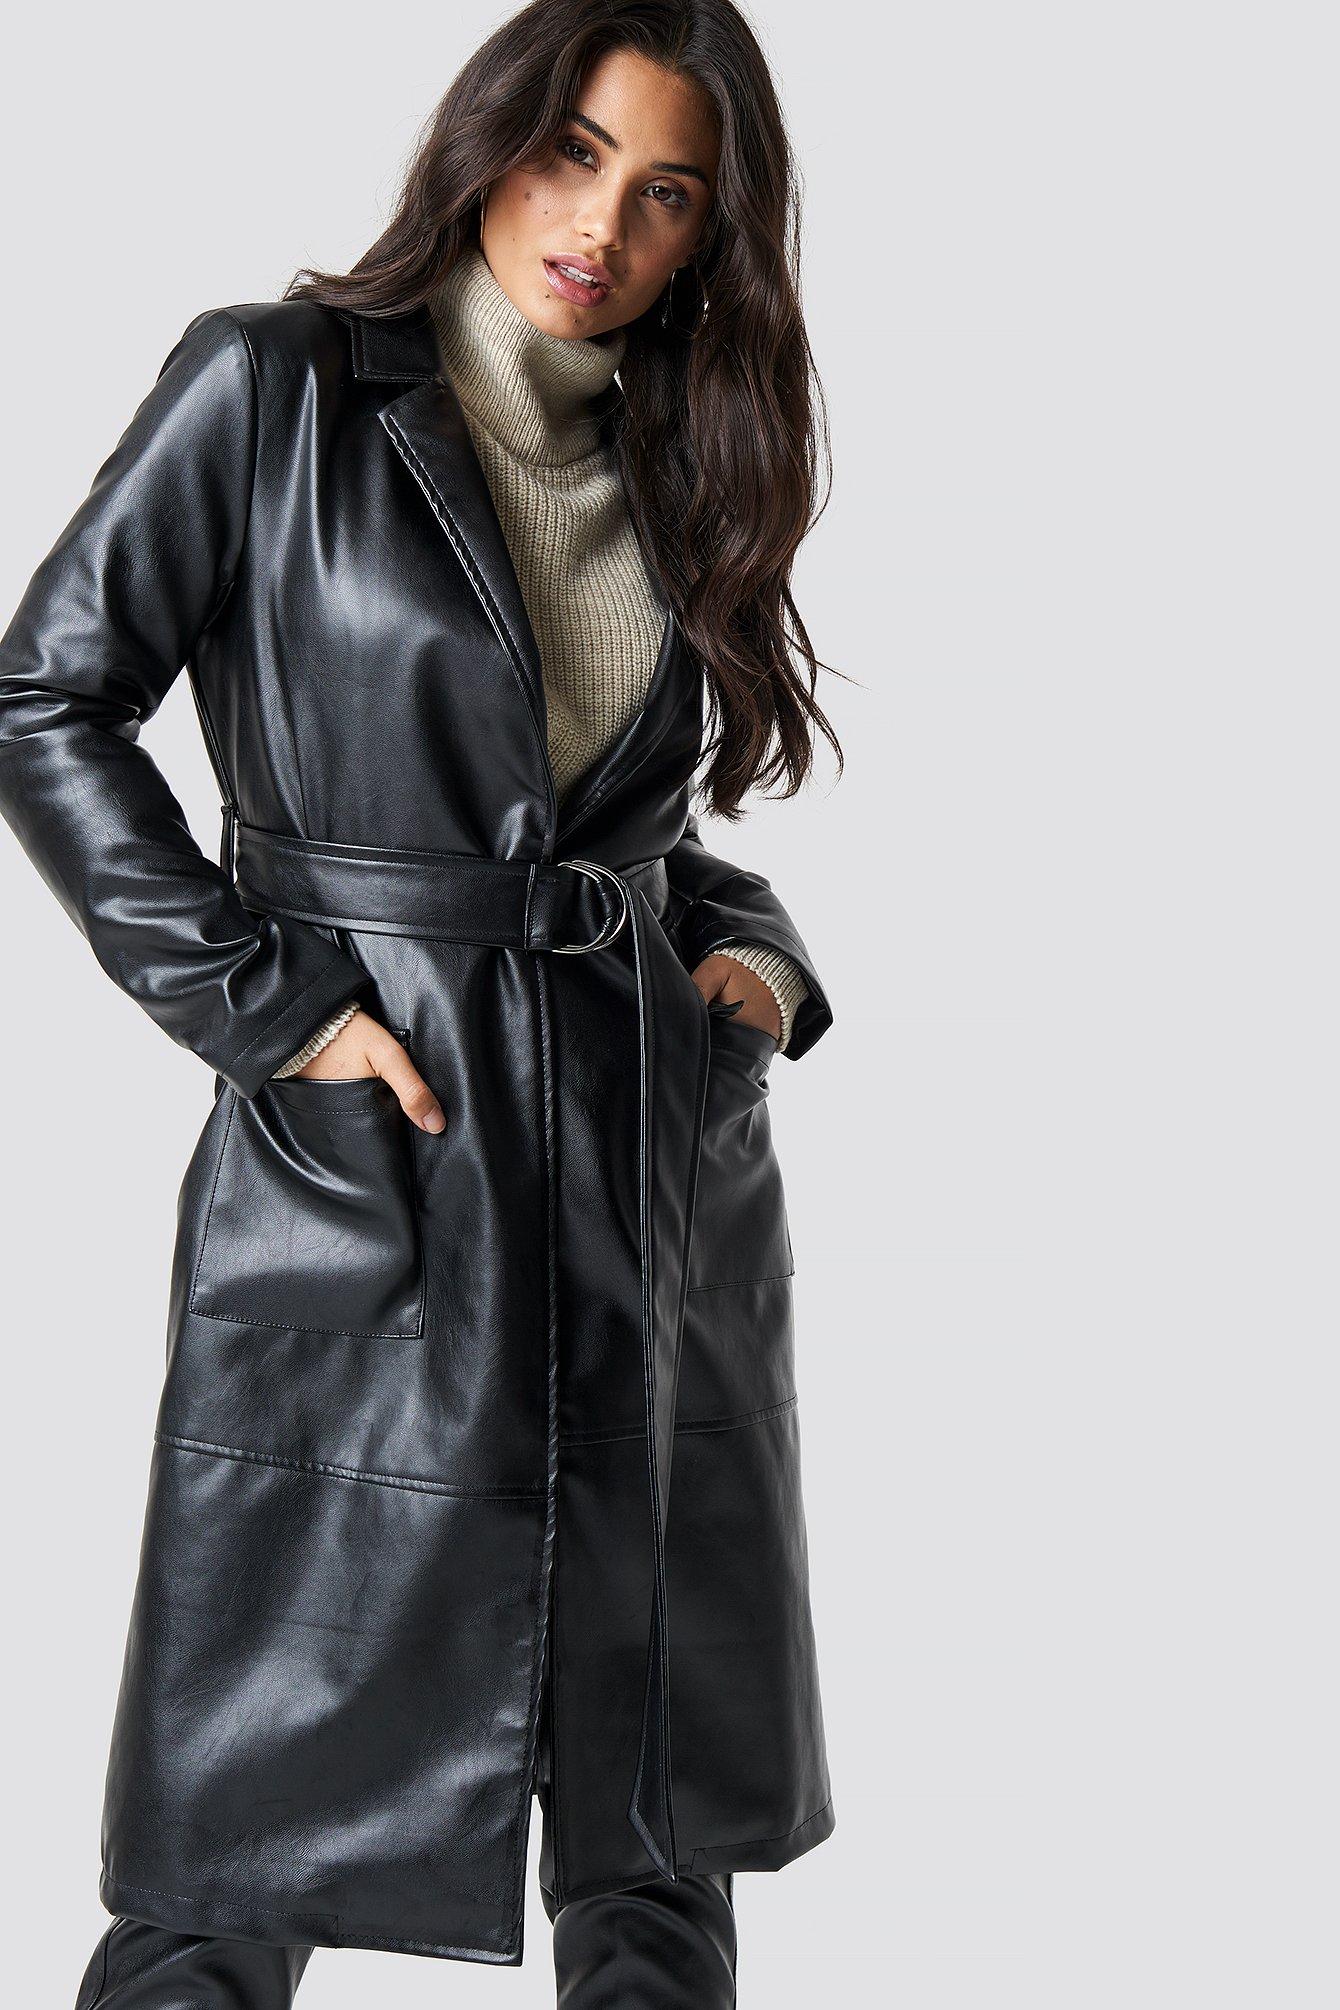 CHLOEXNAKD Faux Leather Coat - Black